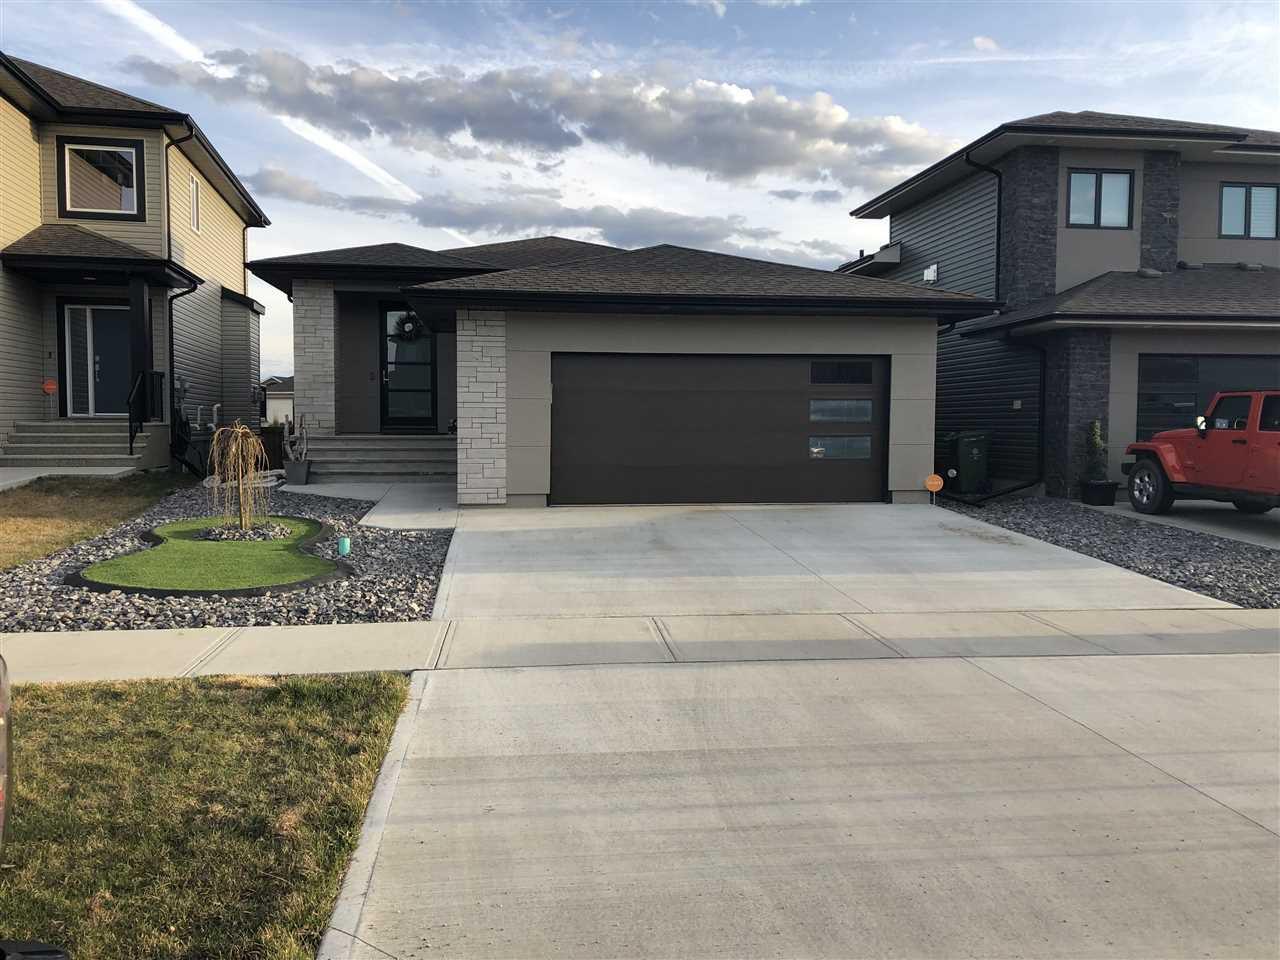 Main Photo: 445 MEADOWVIEW Drive: Fort Saskatchewan House for sale : MLS®# E4154548